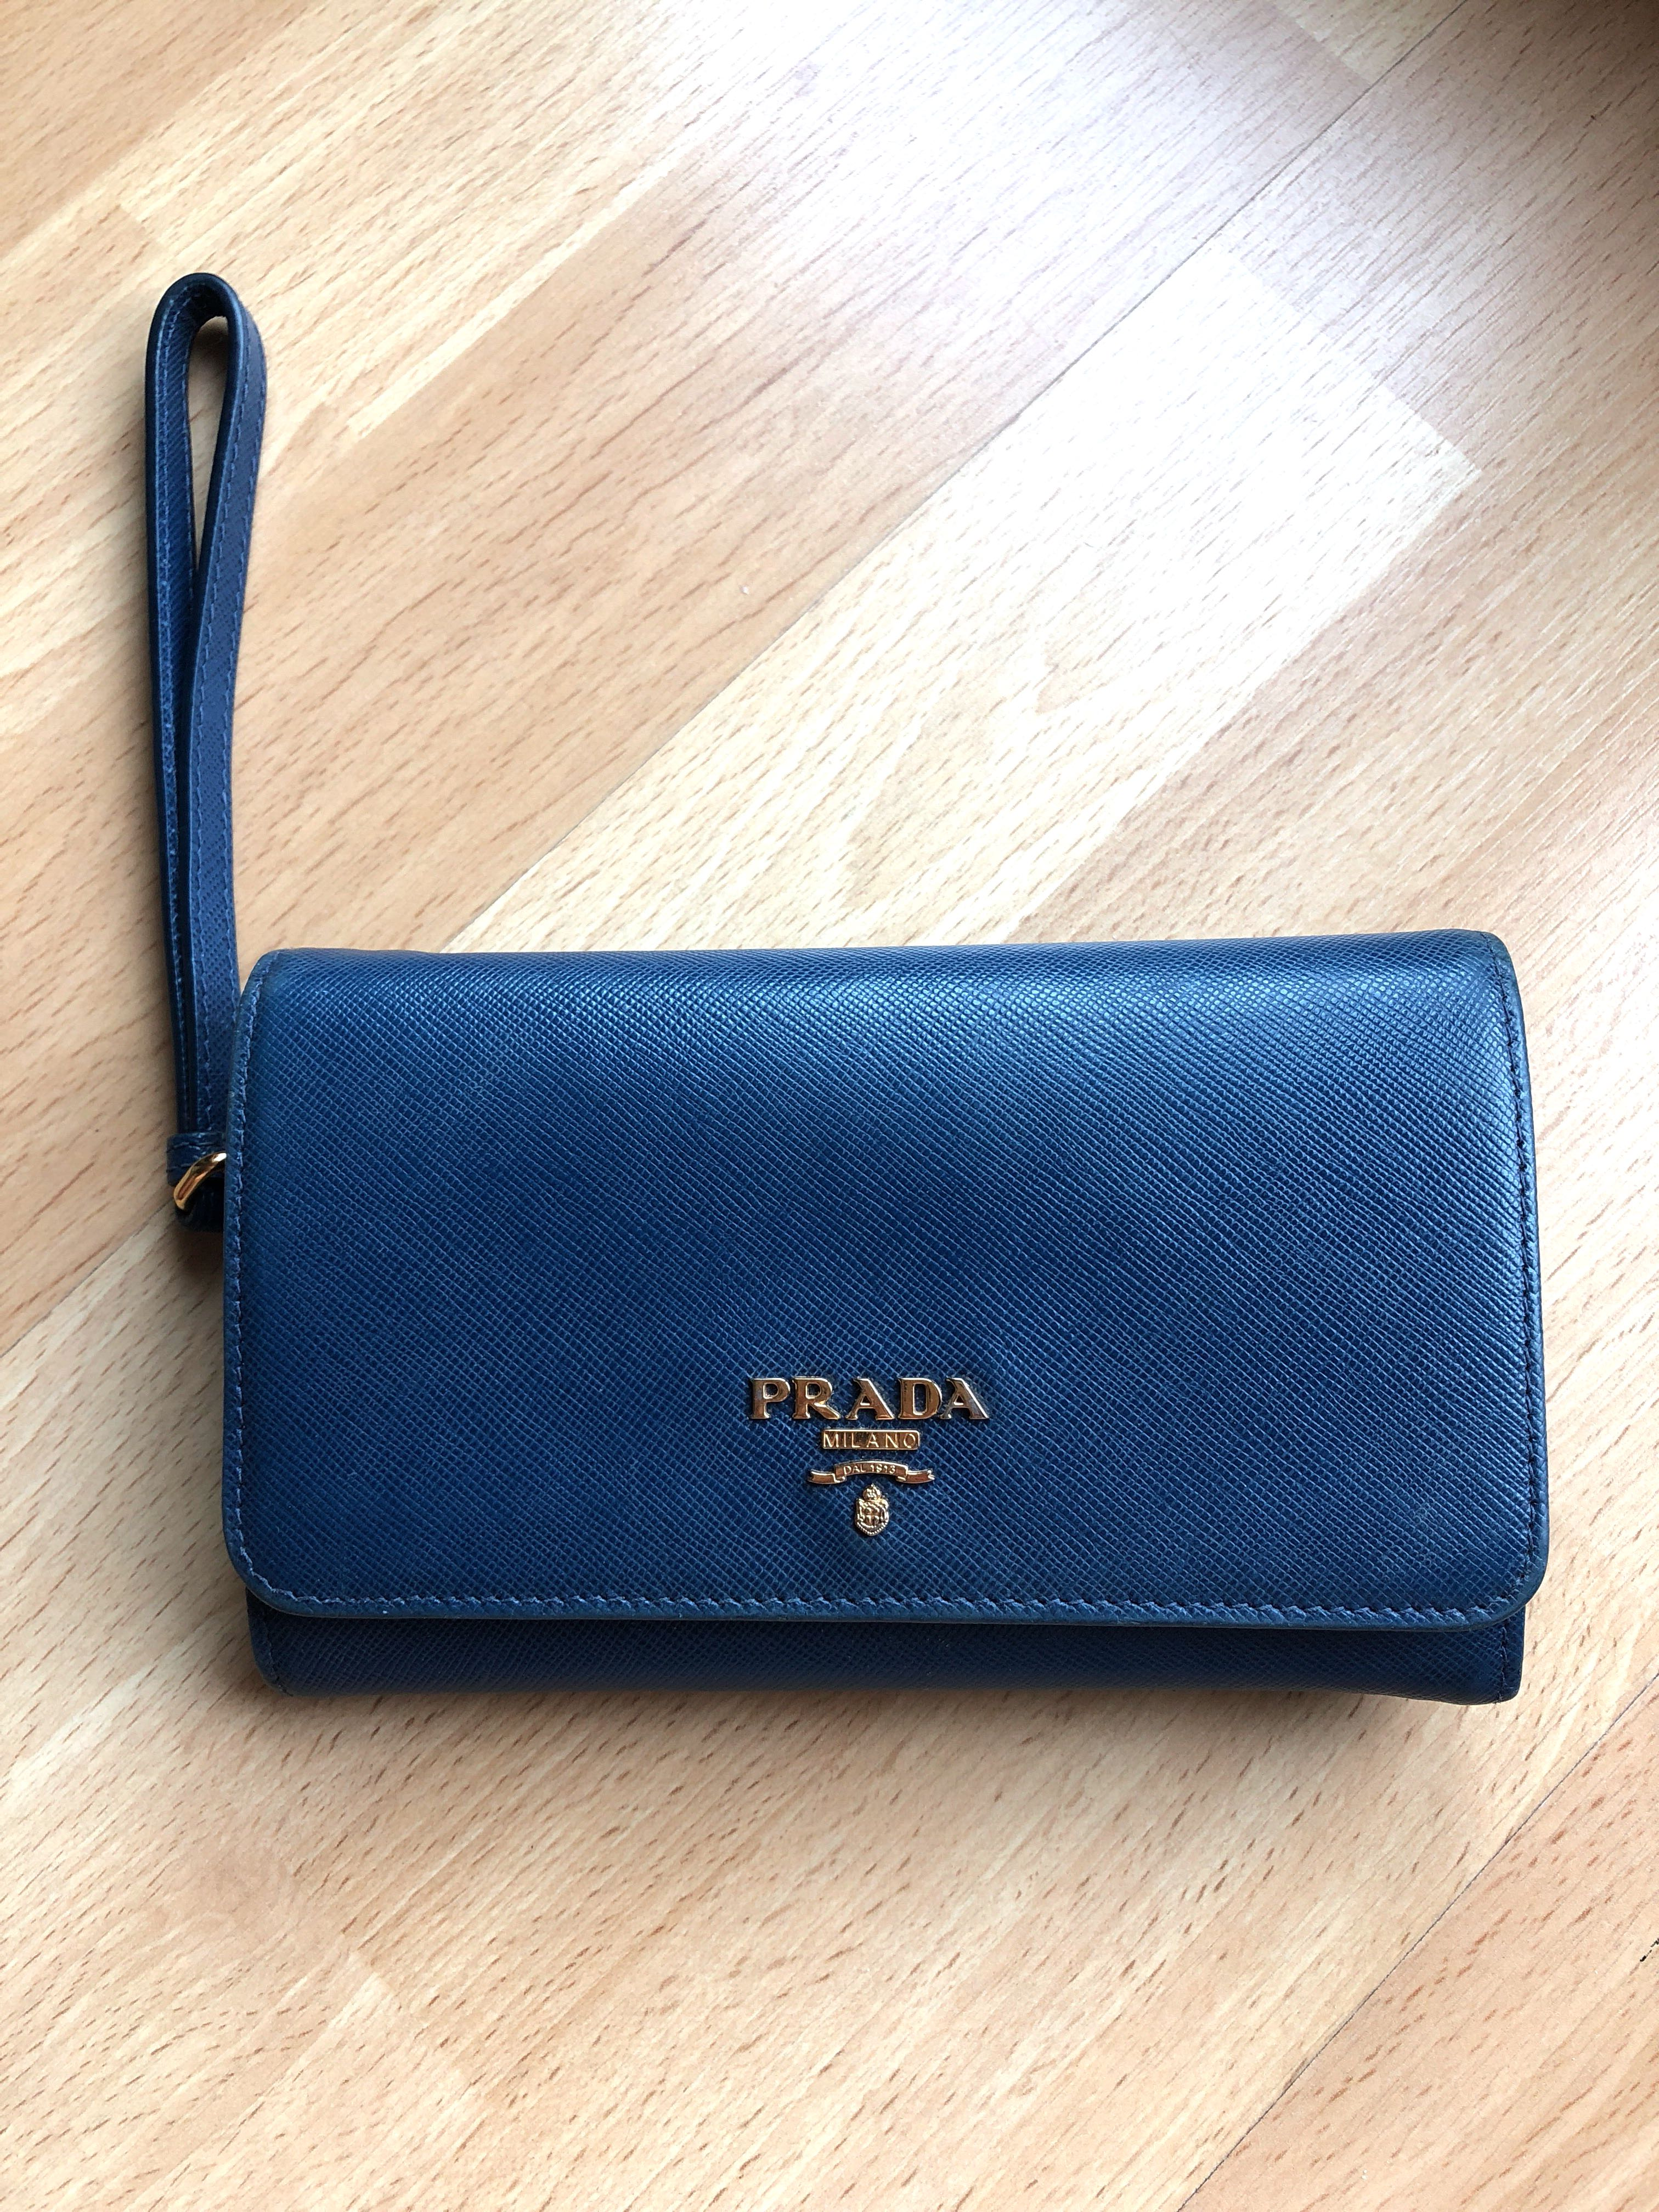 30bcd89cf9c5 Prada Dark Blue Wallet